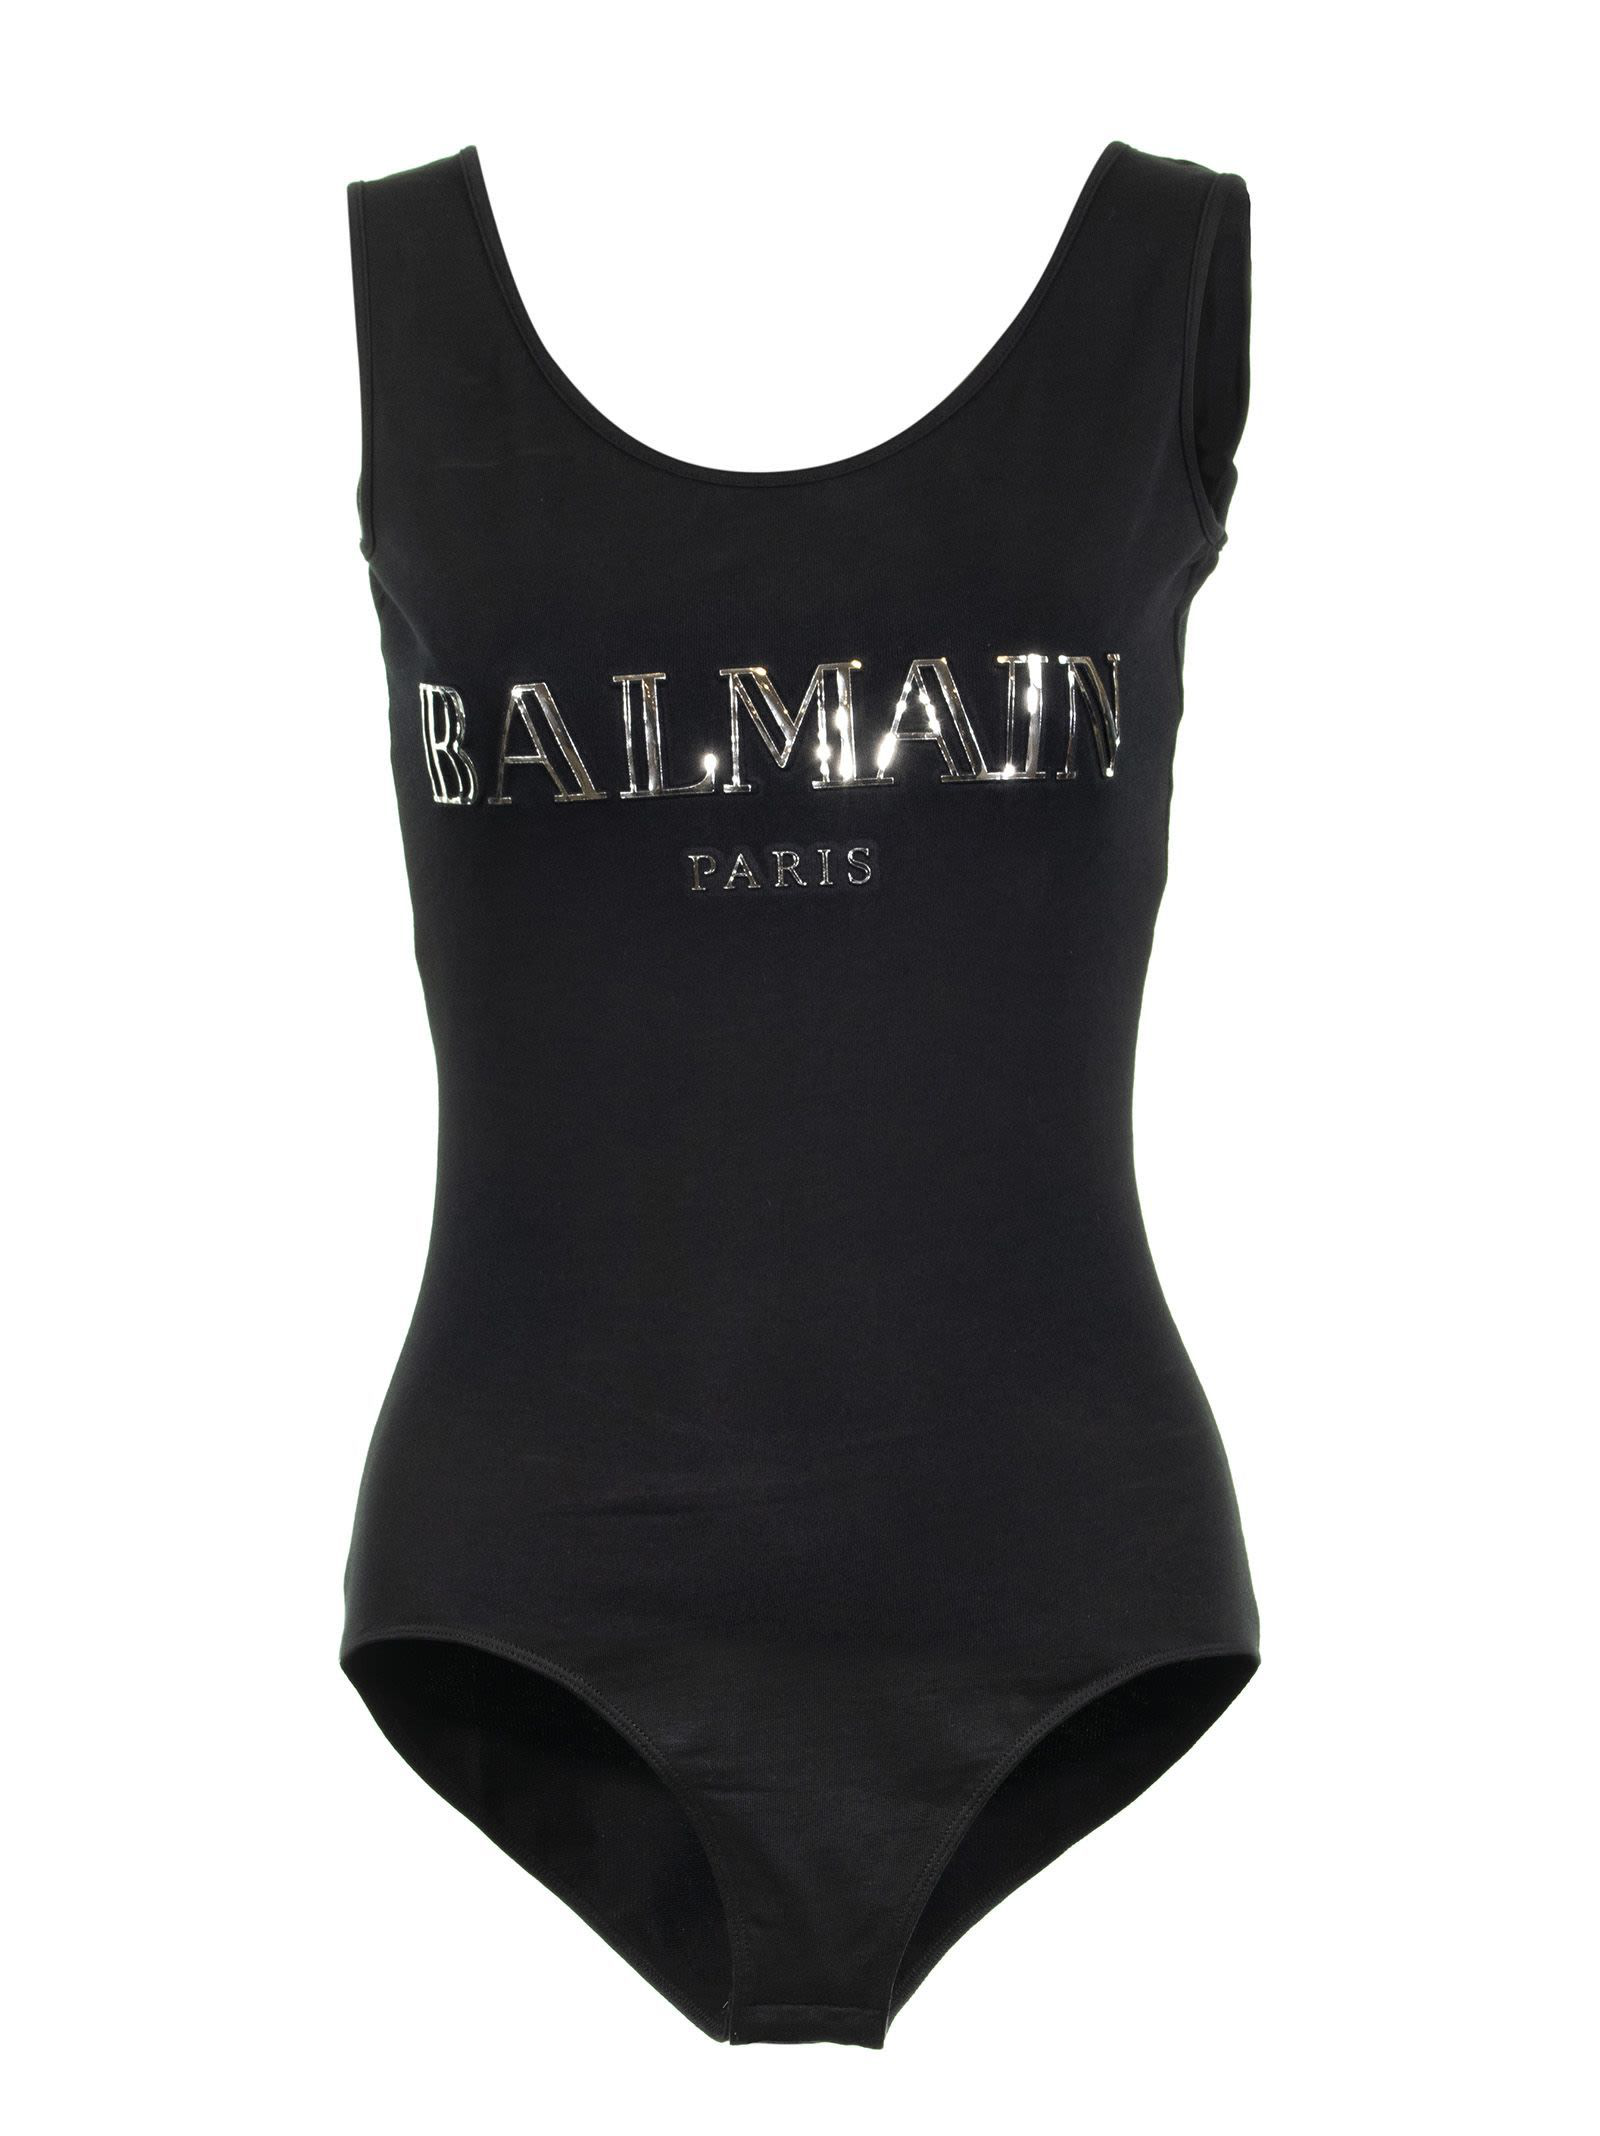 Balmain Logo Printed Bodysuit In Black